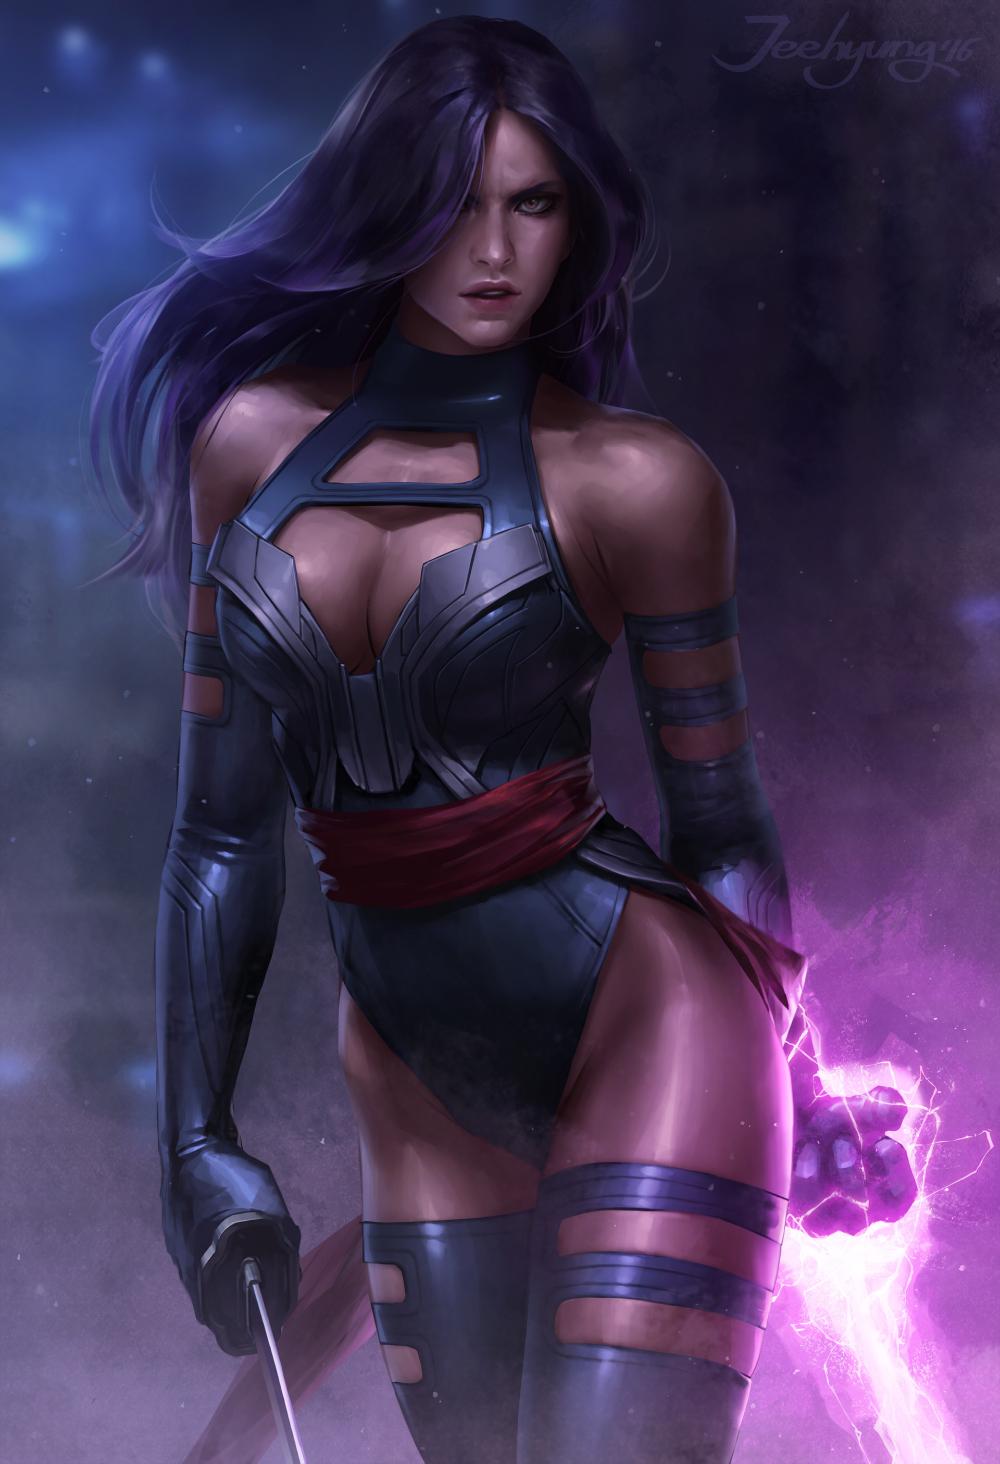 Artstation X Men Apocalypse Psylocke Jeehyung Lee Psylocke Female Hero Superhero